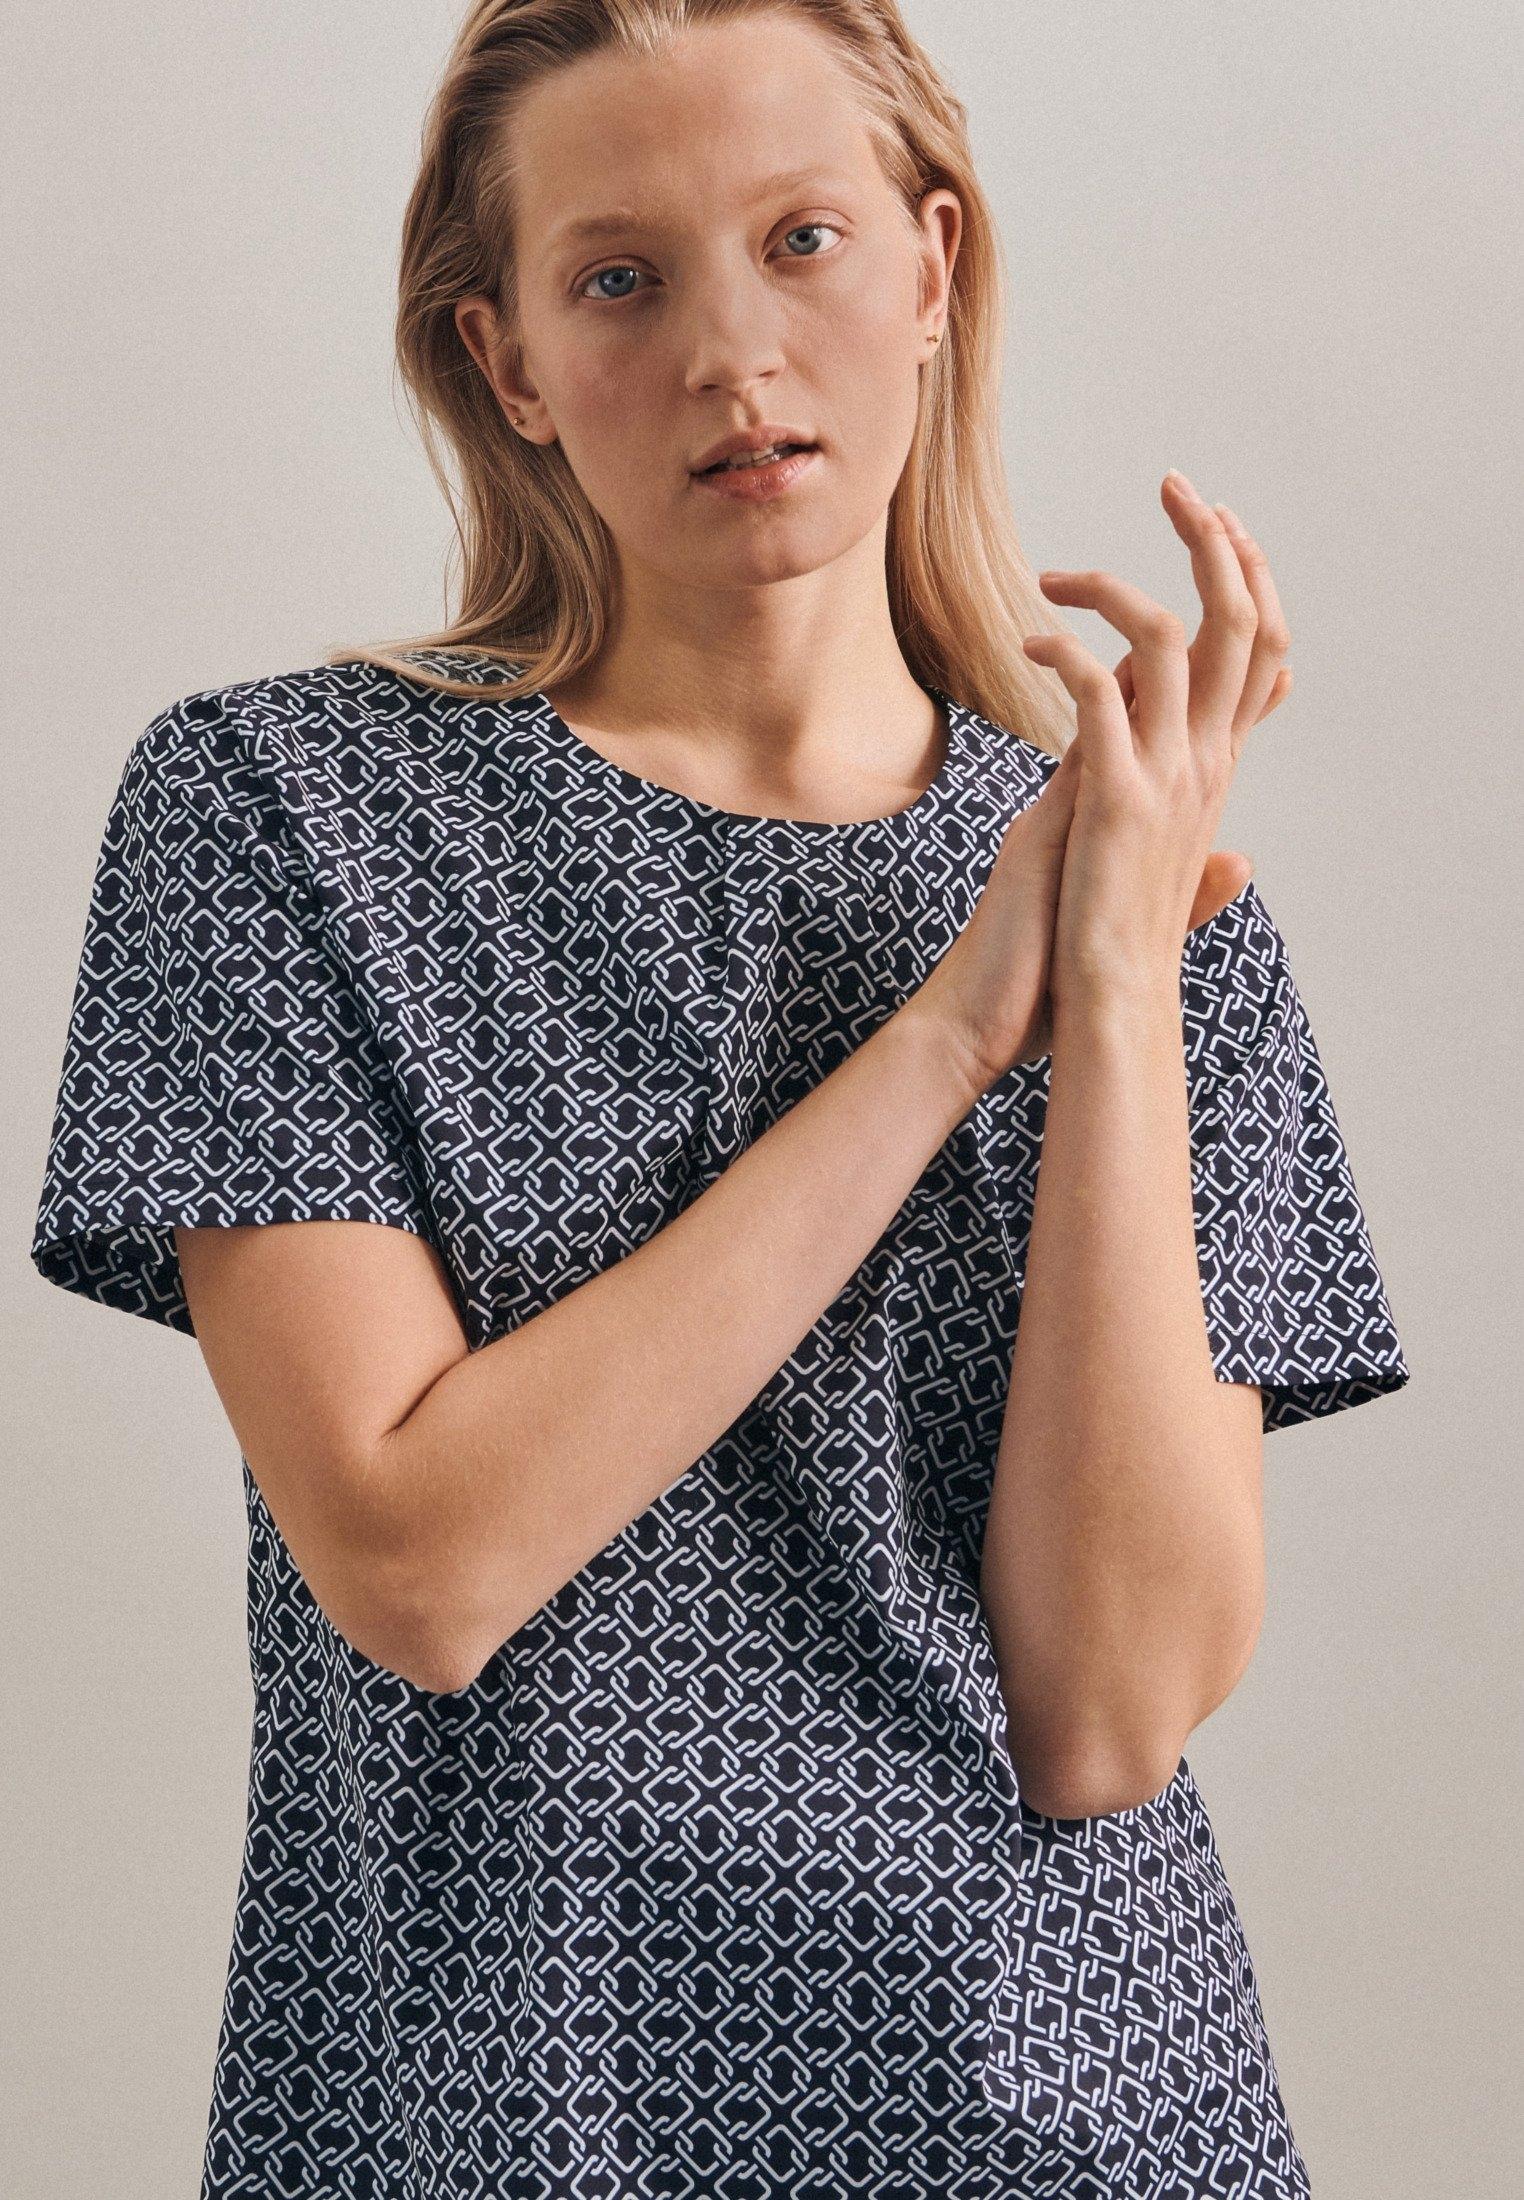 seidensticker Shirtblouse Zwarte roos Korte mouwen ronde hals print nu online kopen bij OTTO